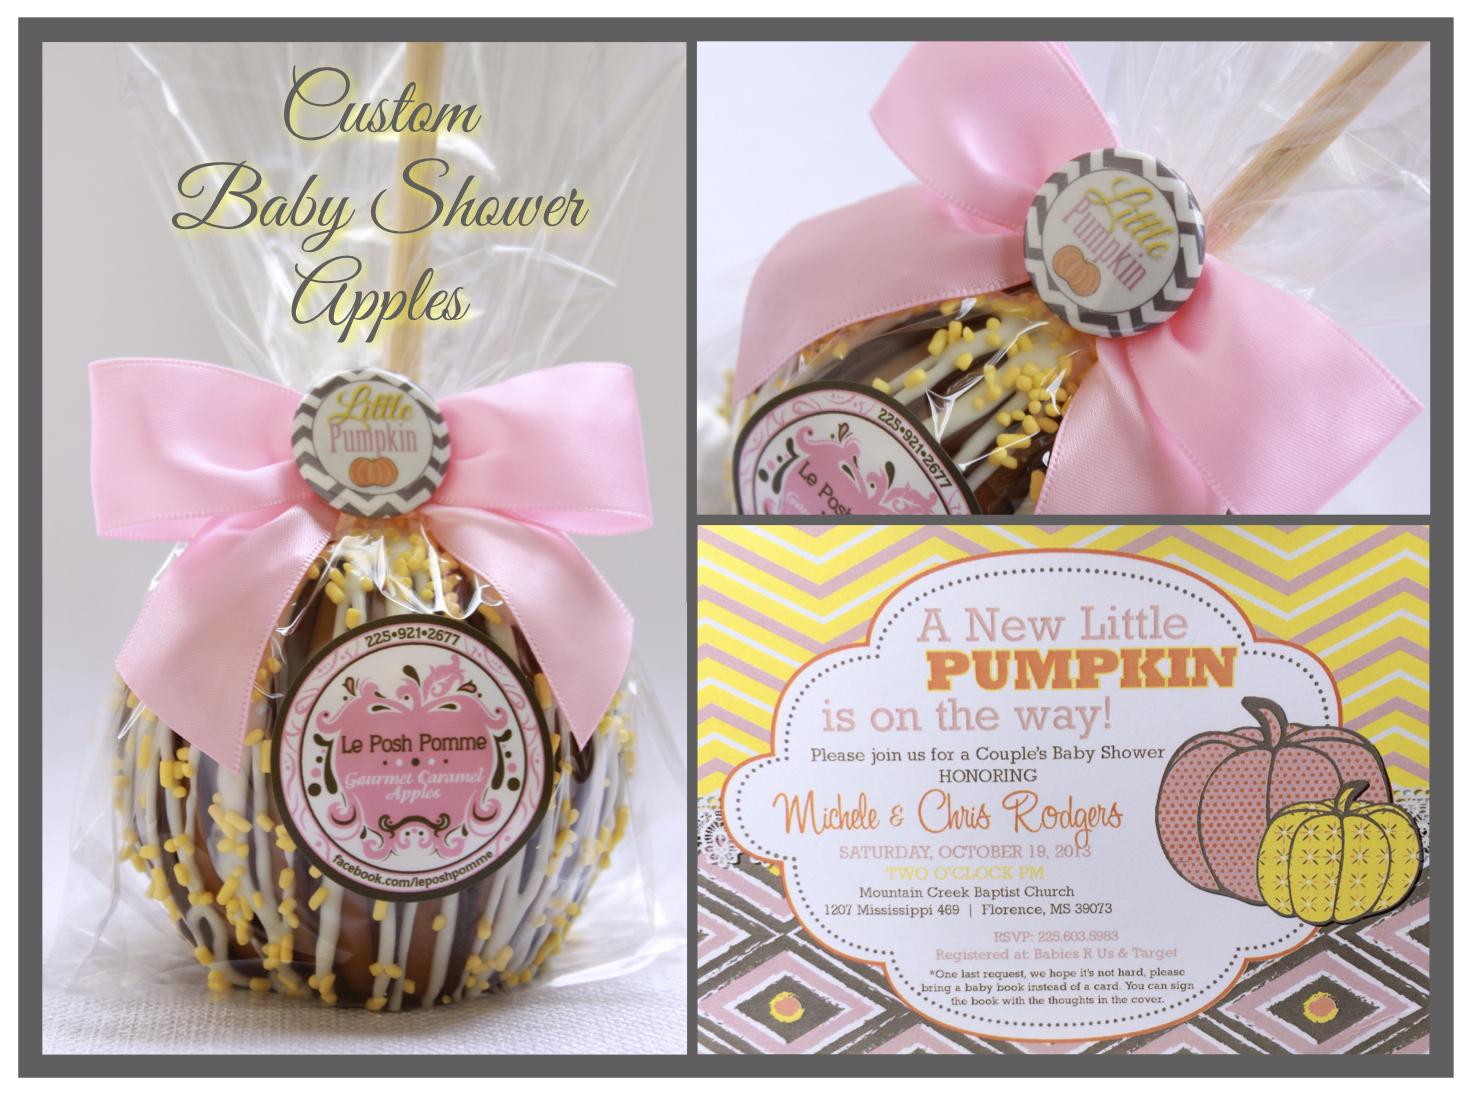 Little Pumpkin Collage.jpg